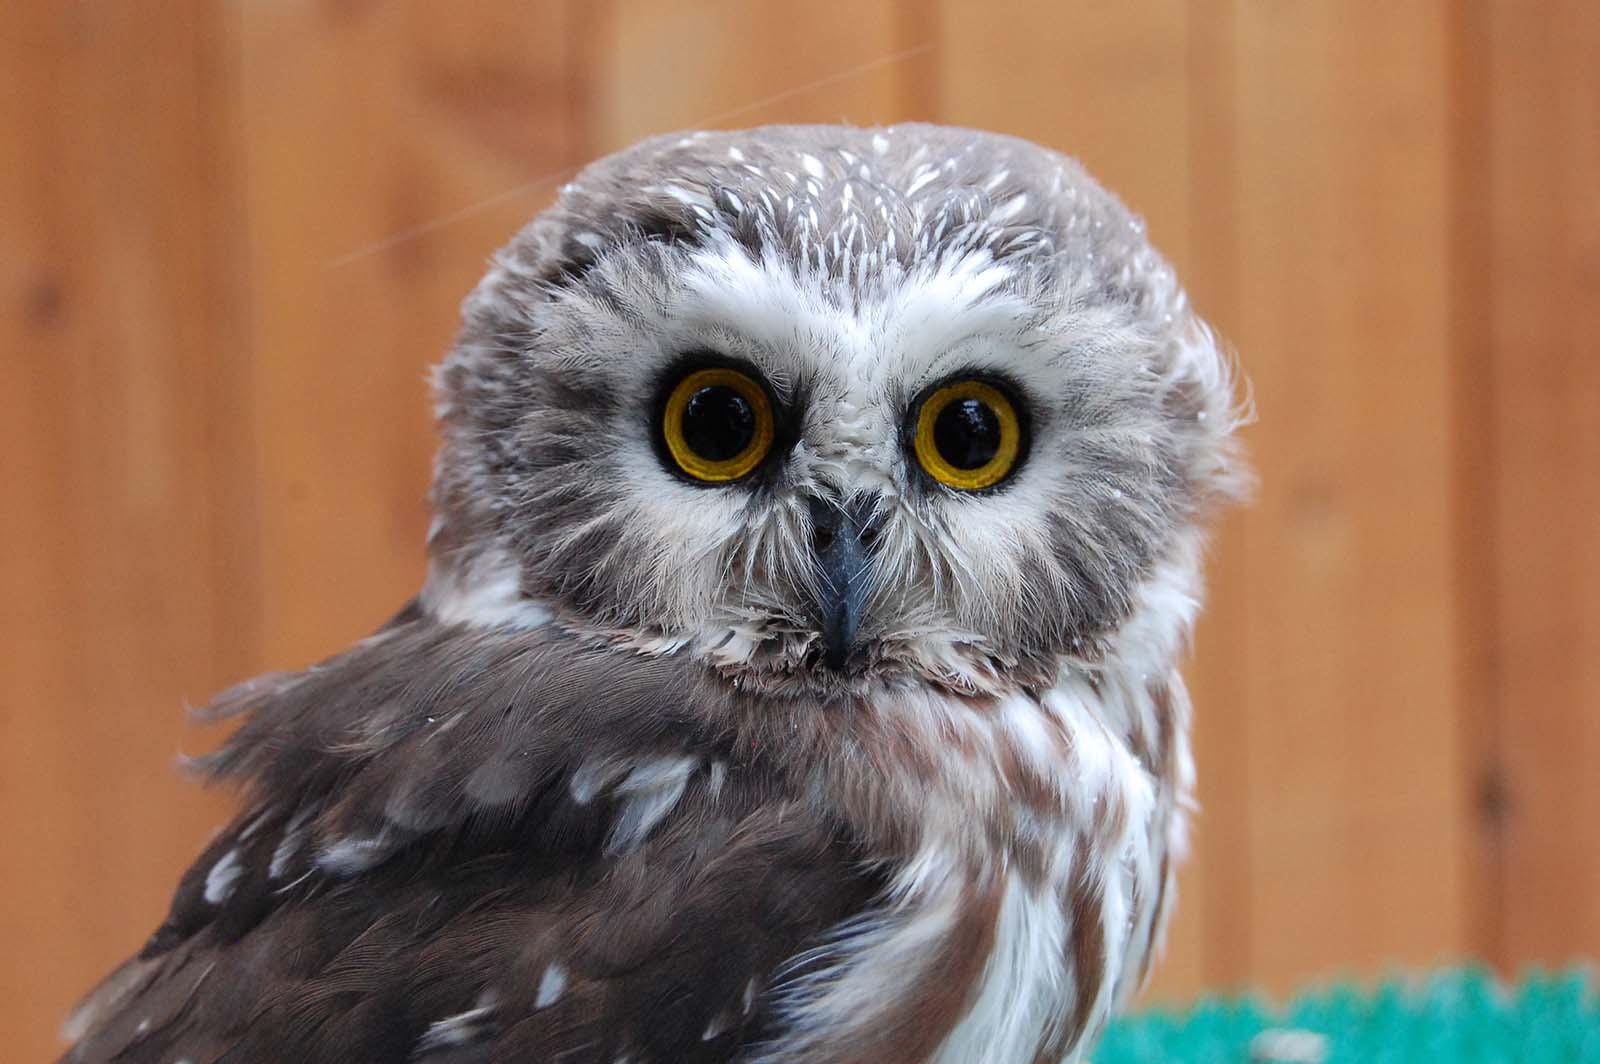 Draper Museum Raptor Experience: Remington the saw-whet owl